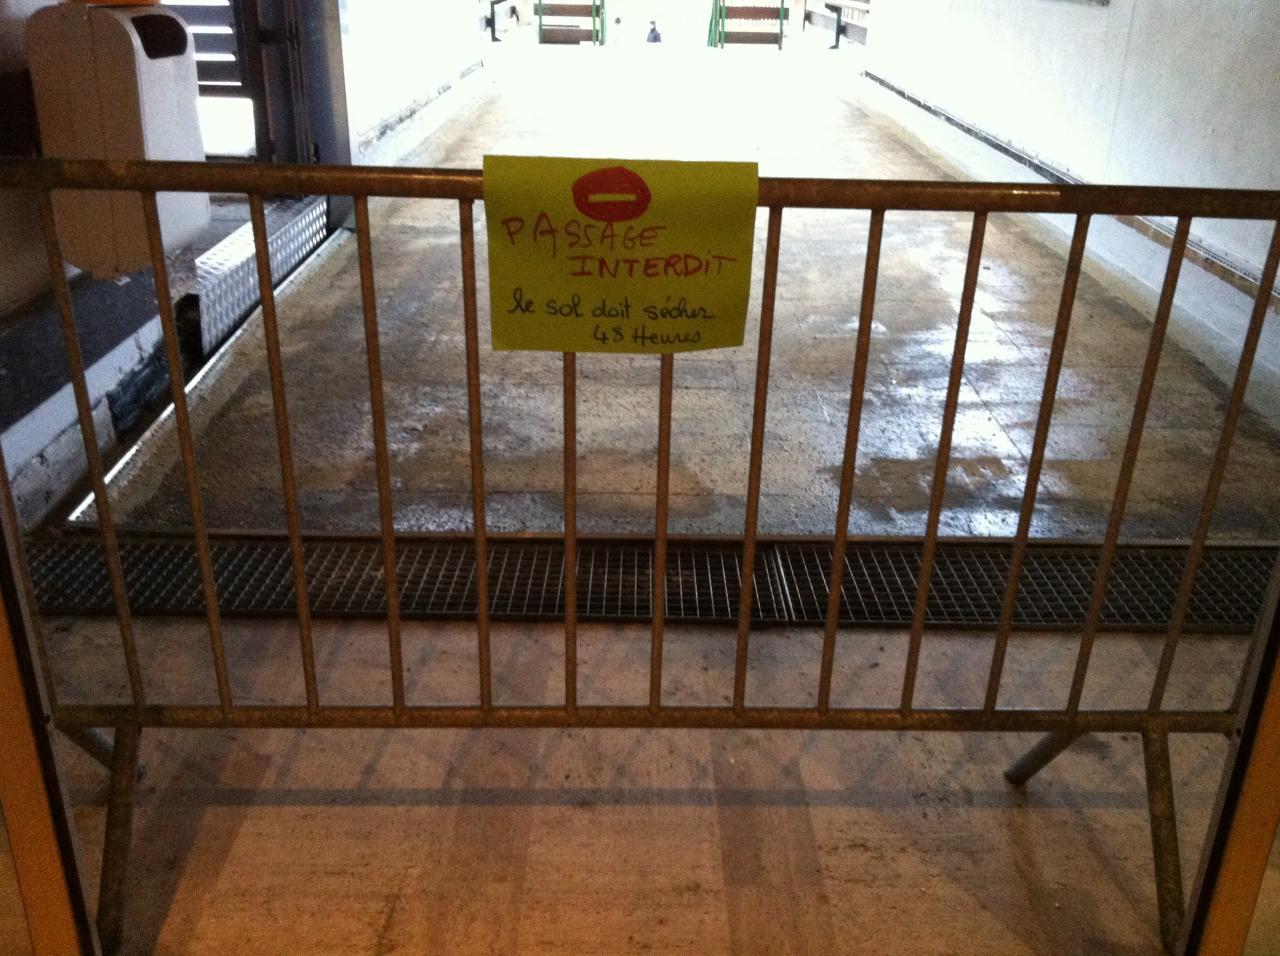 accès interdit mercredi soir